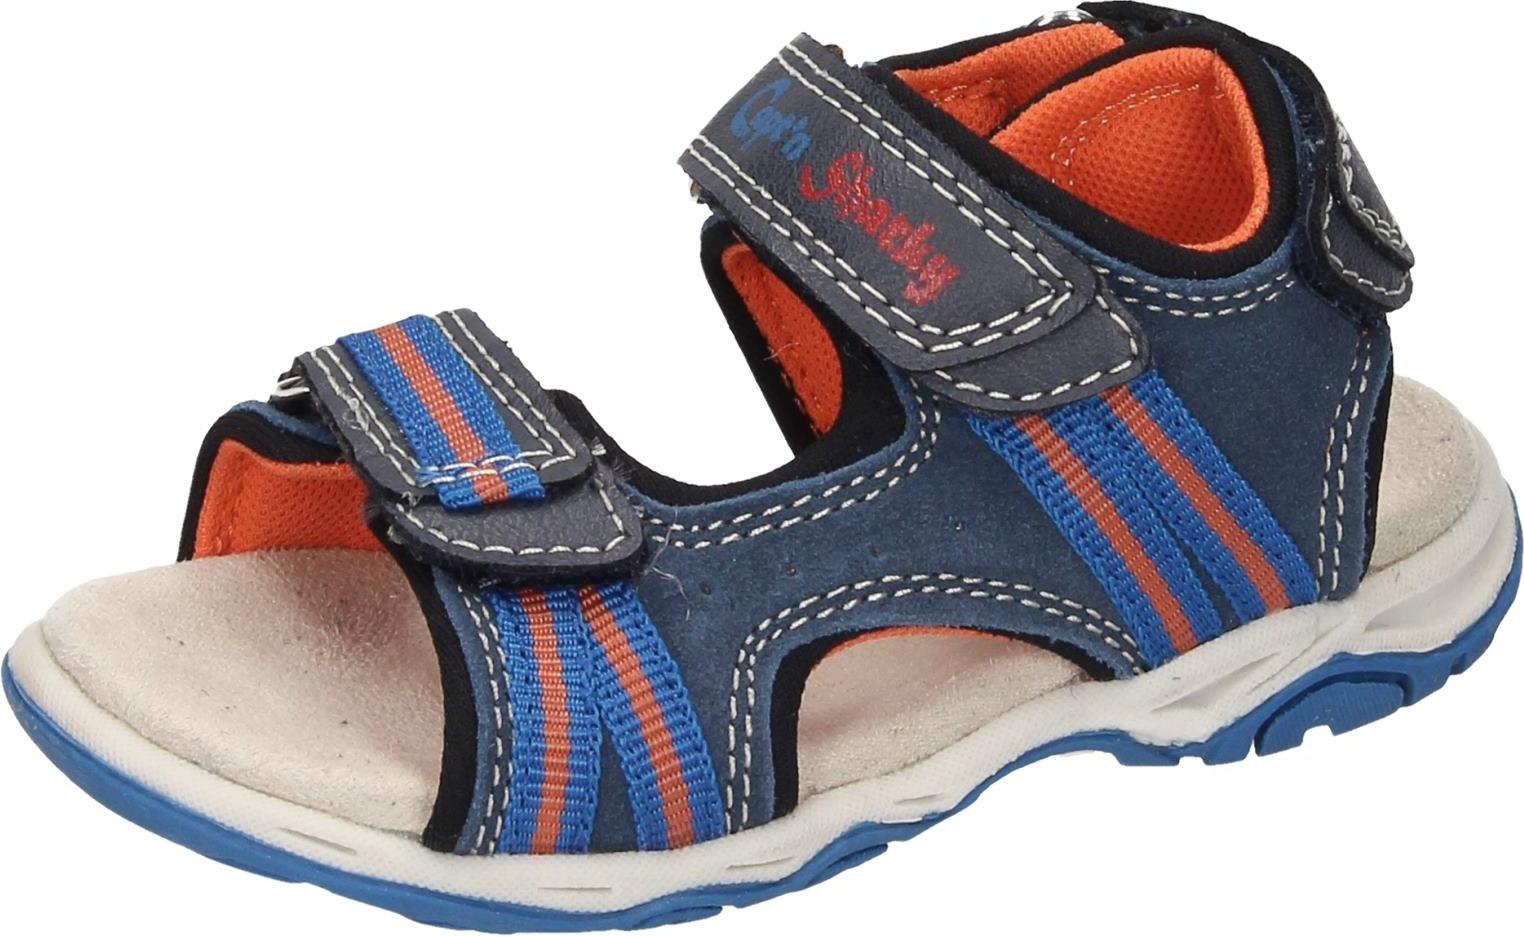 Capt'n Sharky Kinder Jungen Schuhe Jungen Sandale blau Veloursleder NEU